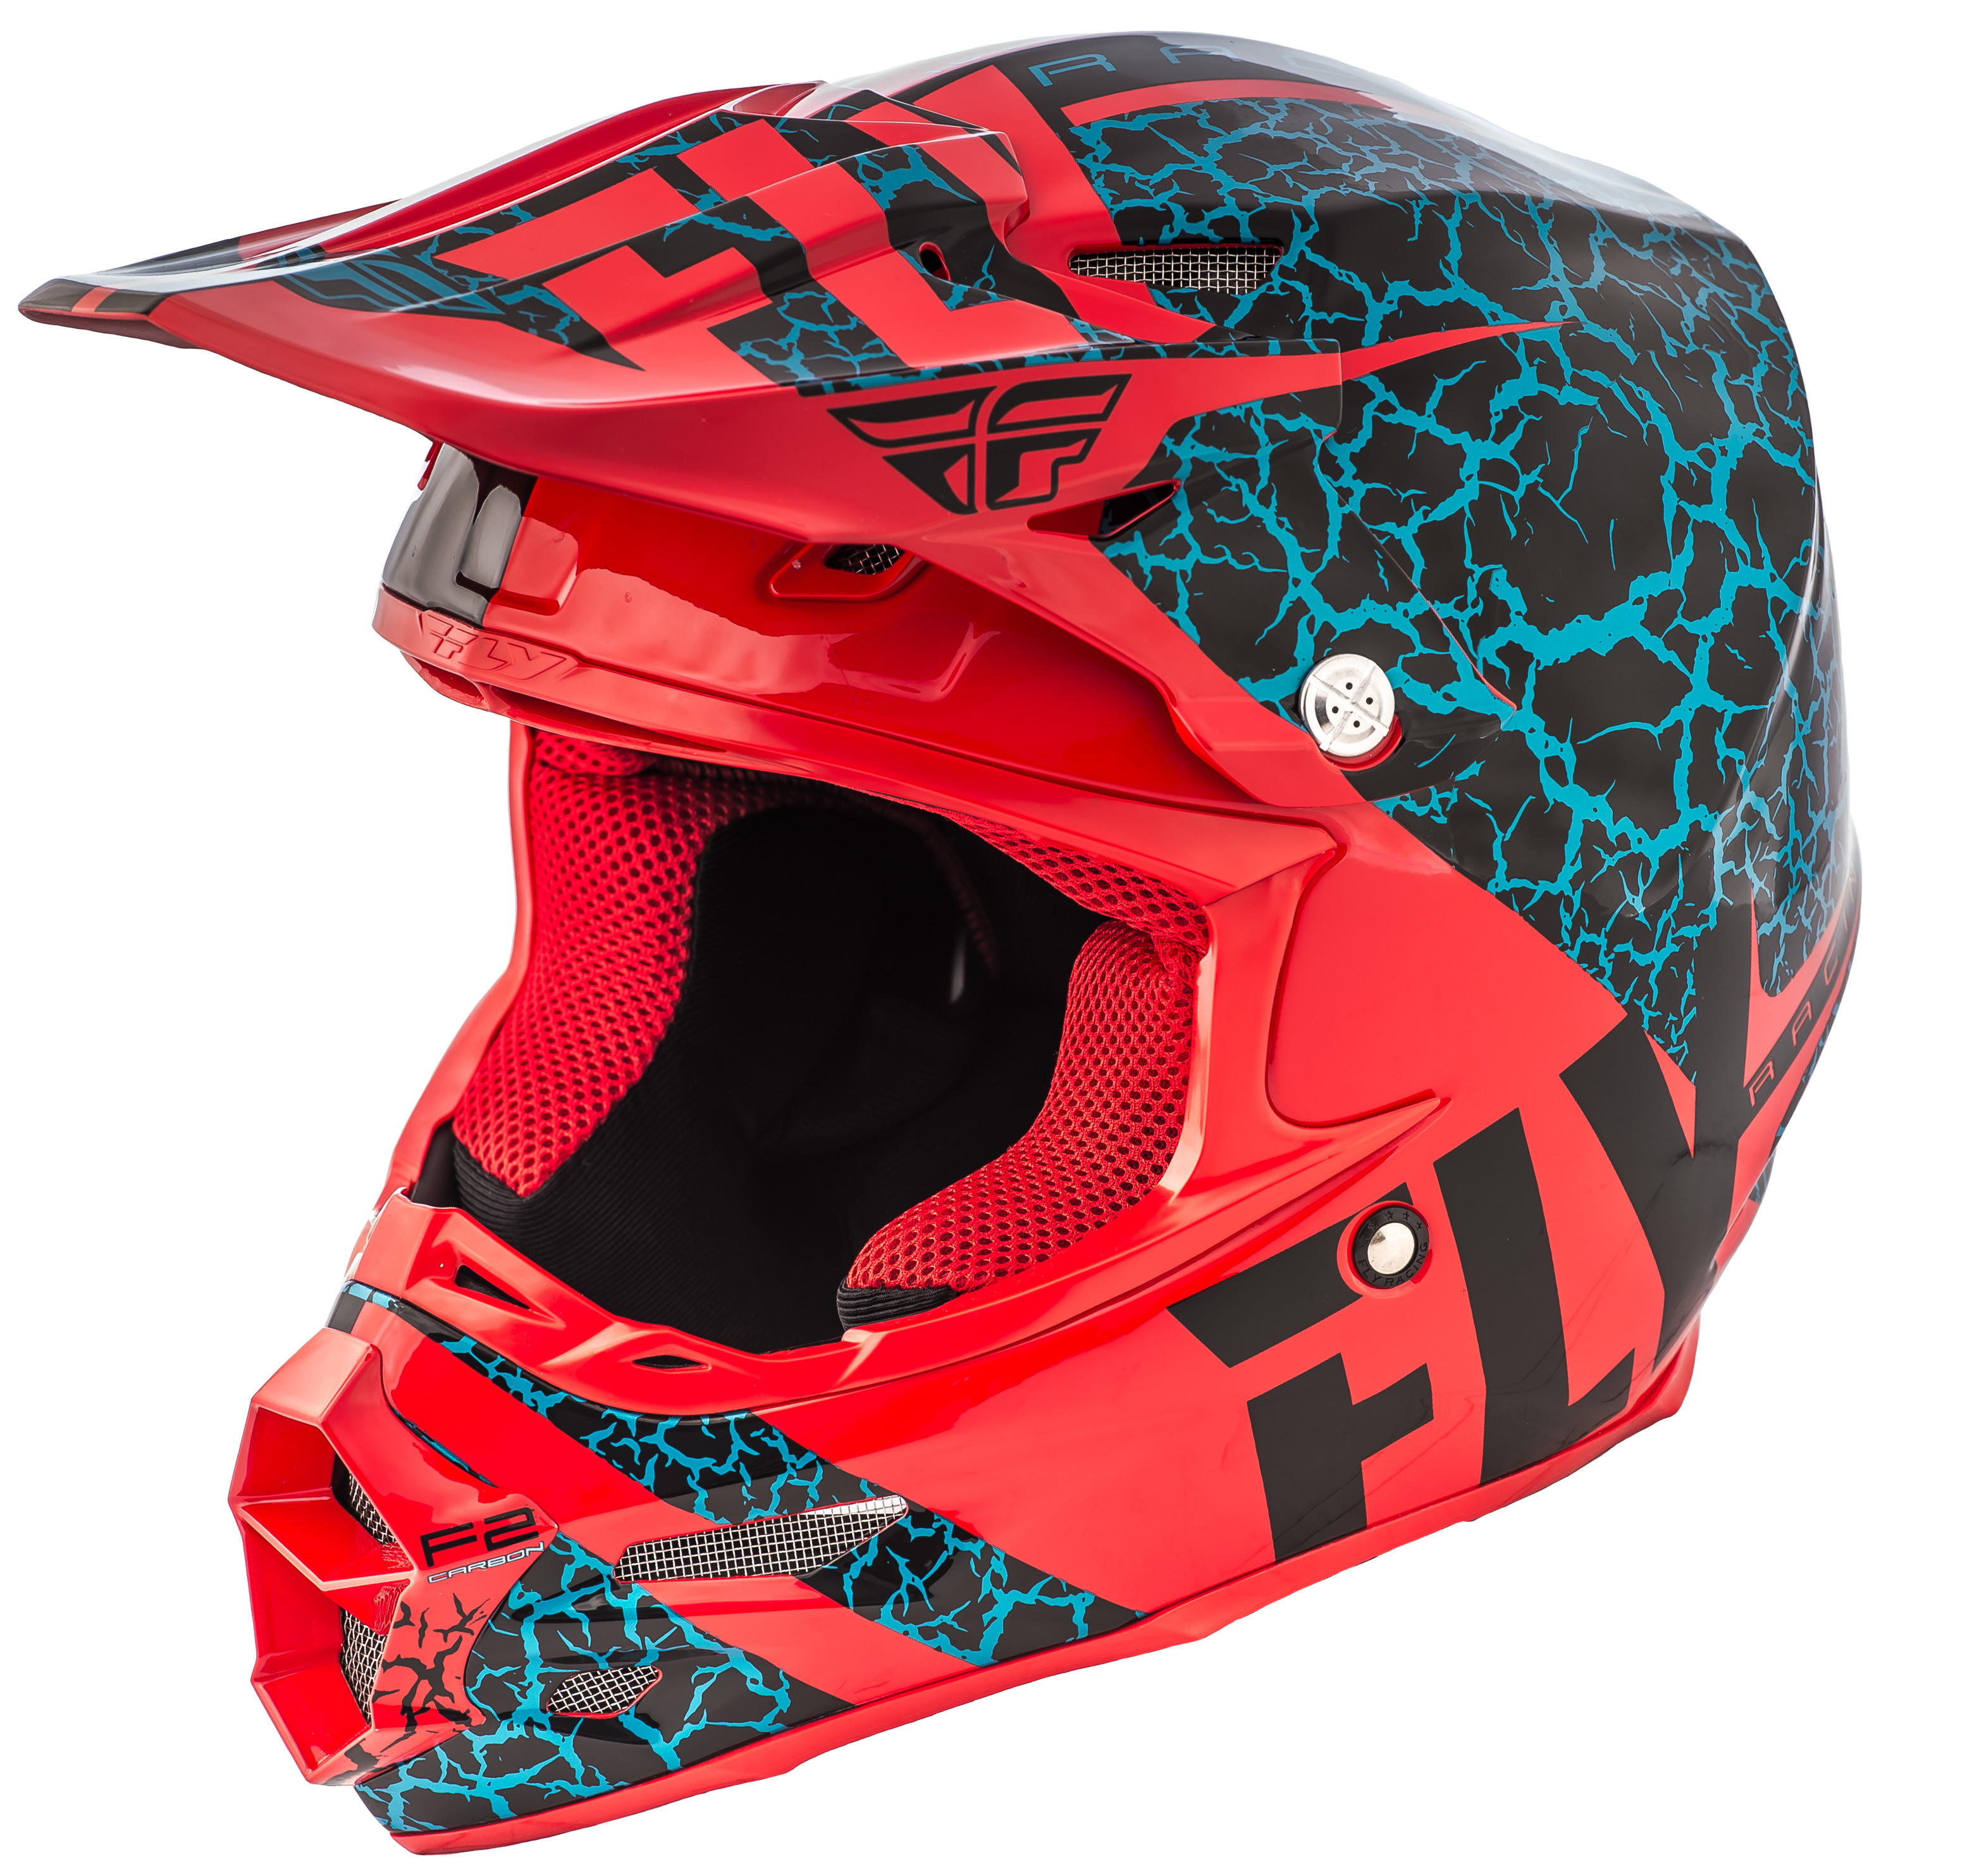 F2 Carbon Fracture Helmet Black/Red/Light Blue 2X